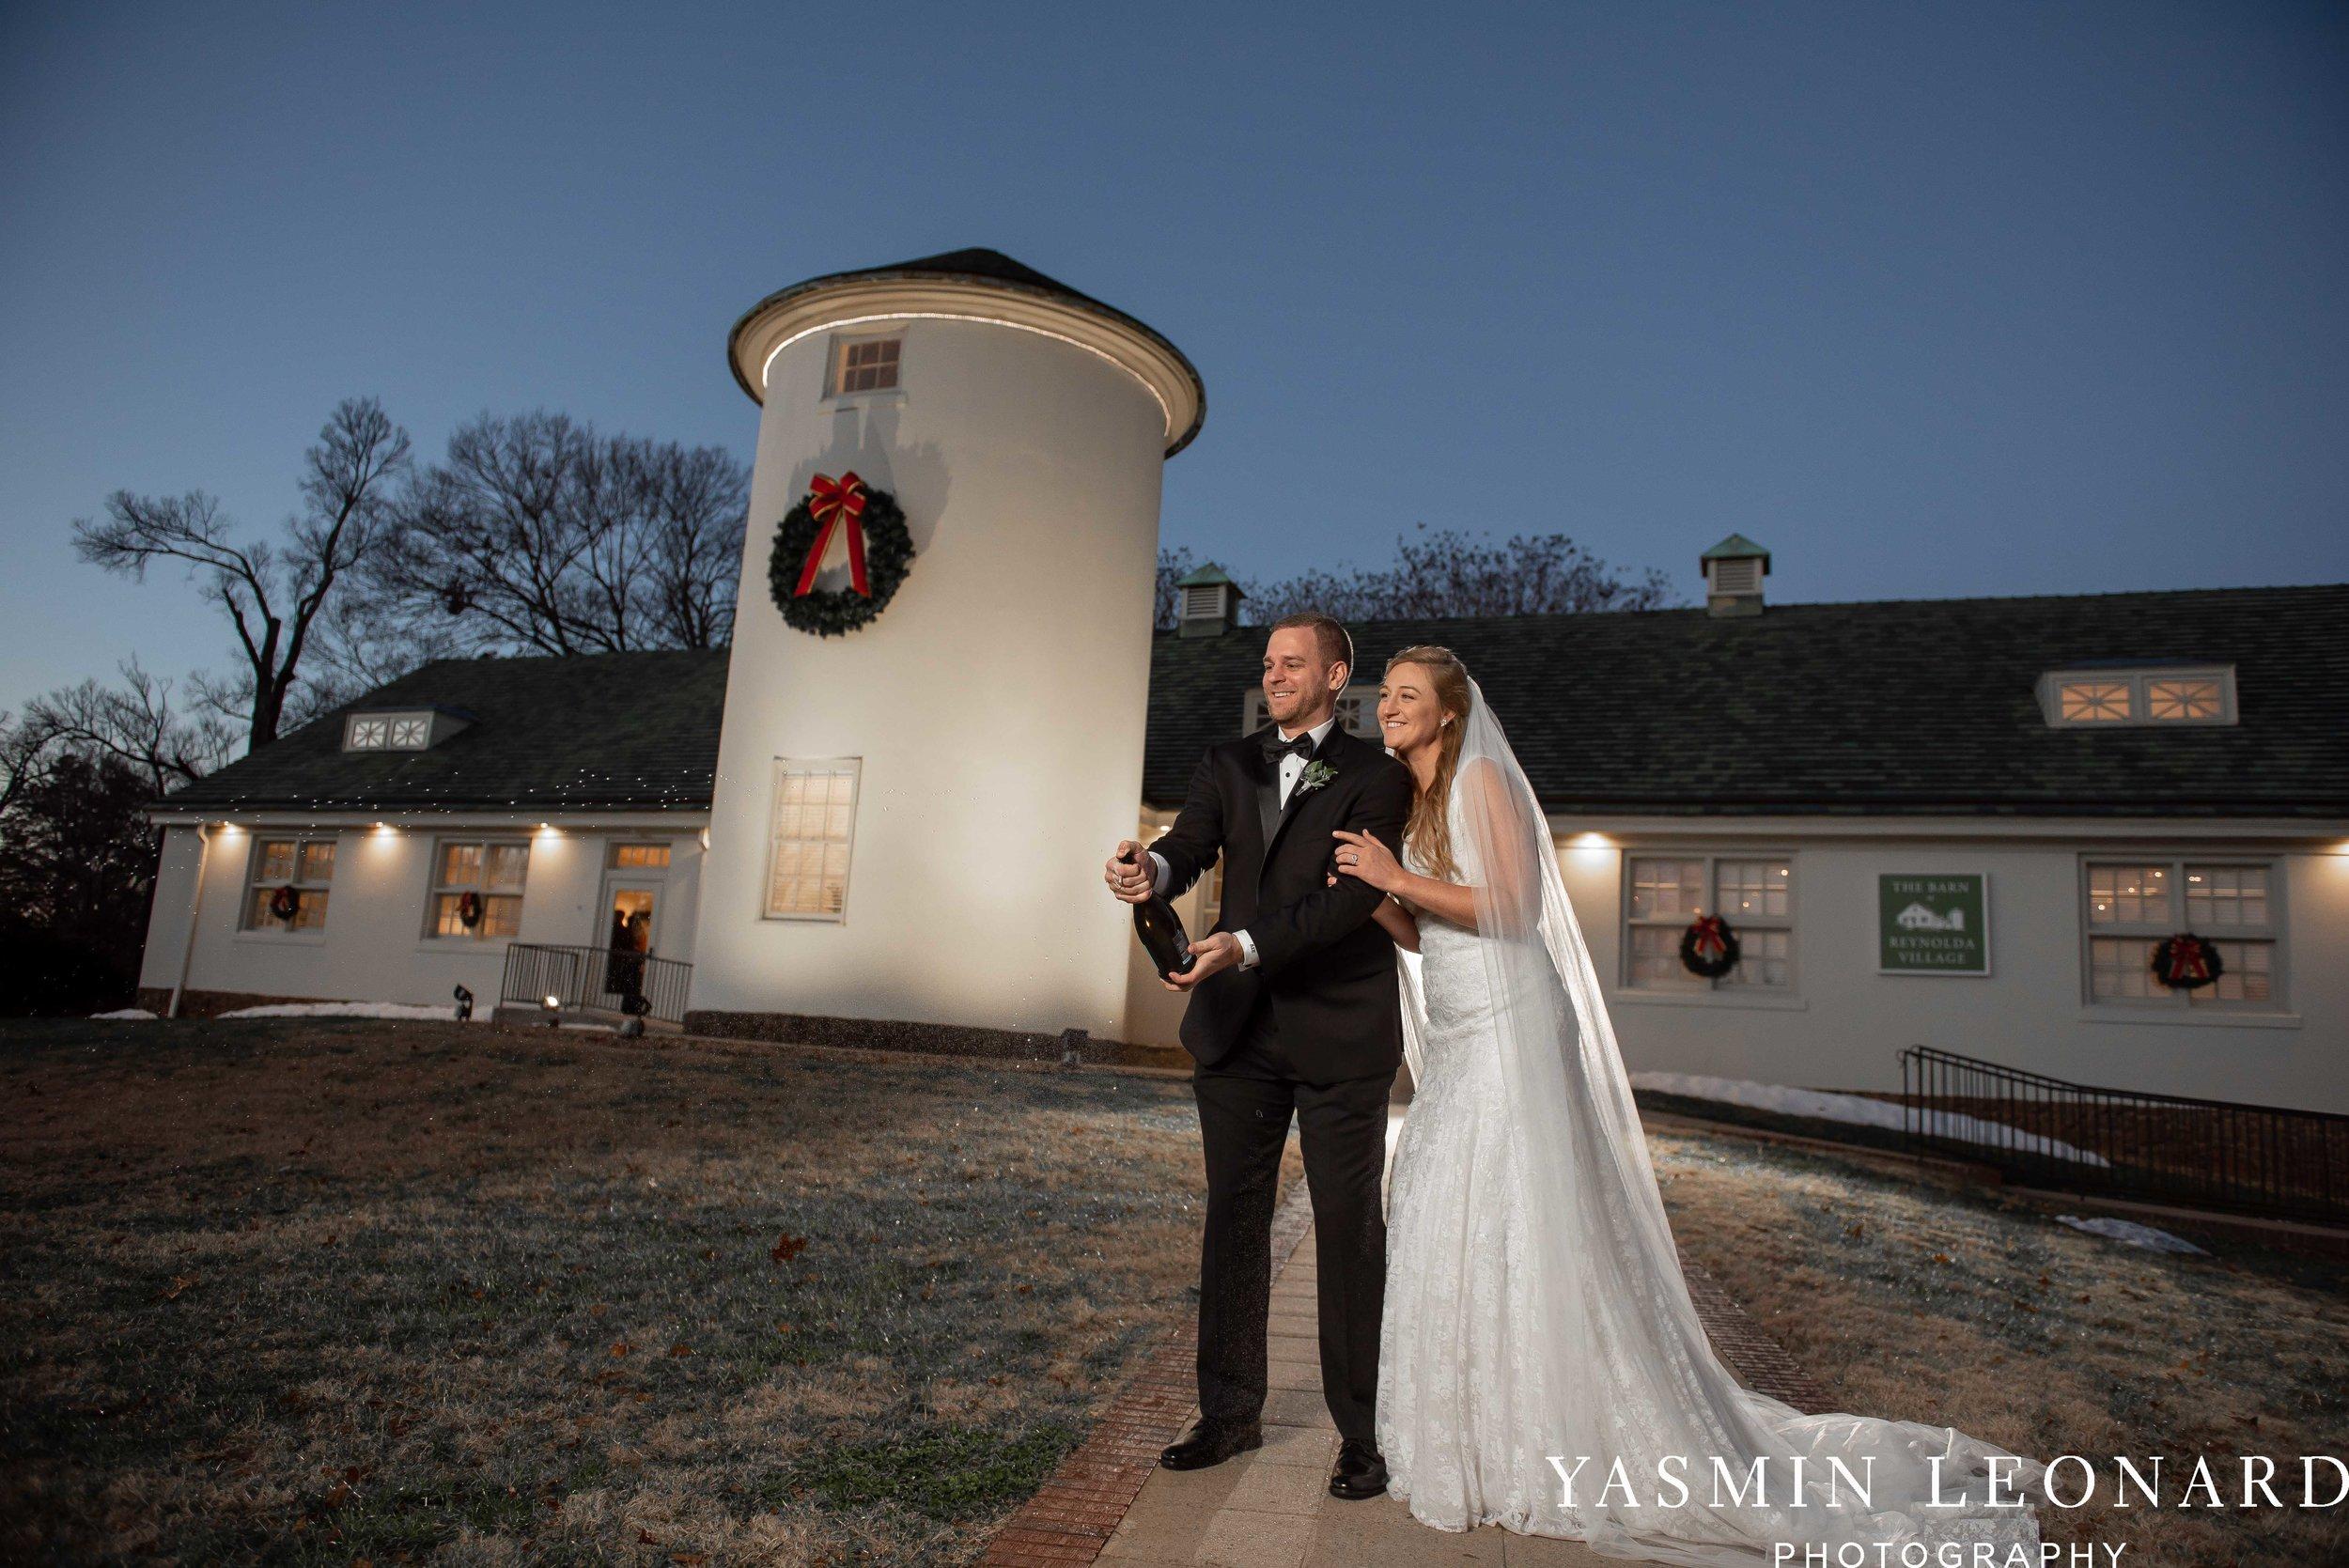 Barn at Reynolda Village - Winston Salem Wedding - White and Green Wedding - NC Wedding - NC Barns - Yasmin Leonard Photography-68.jpg